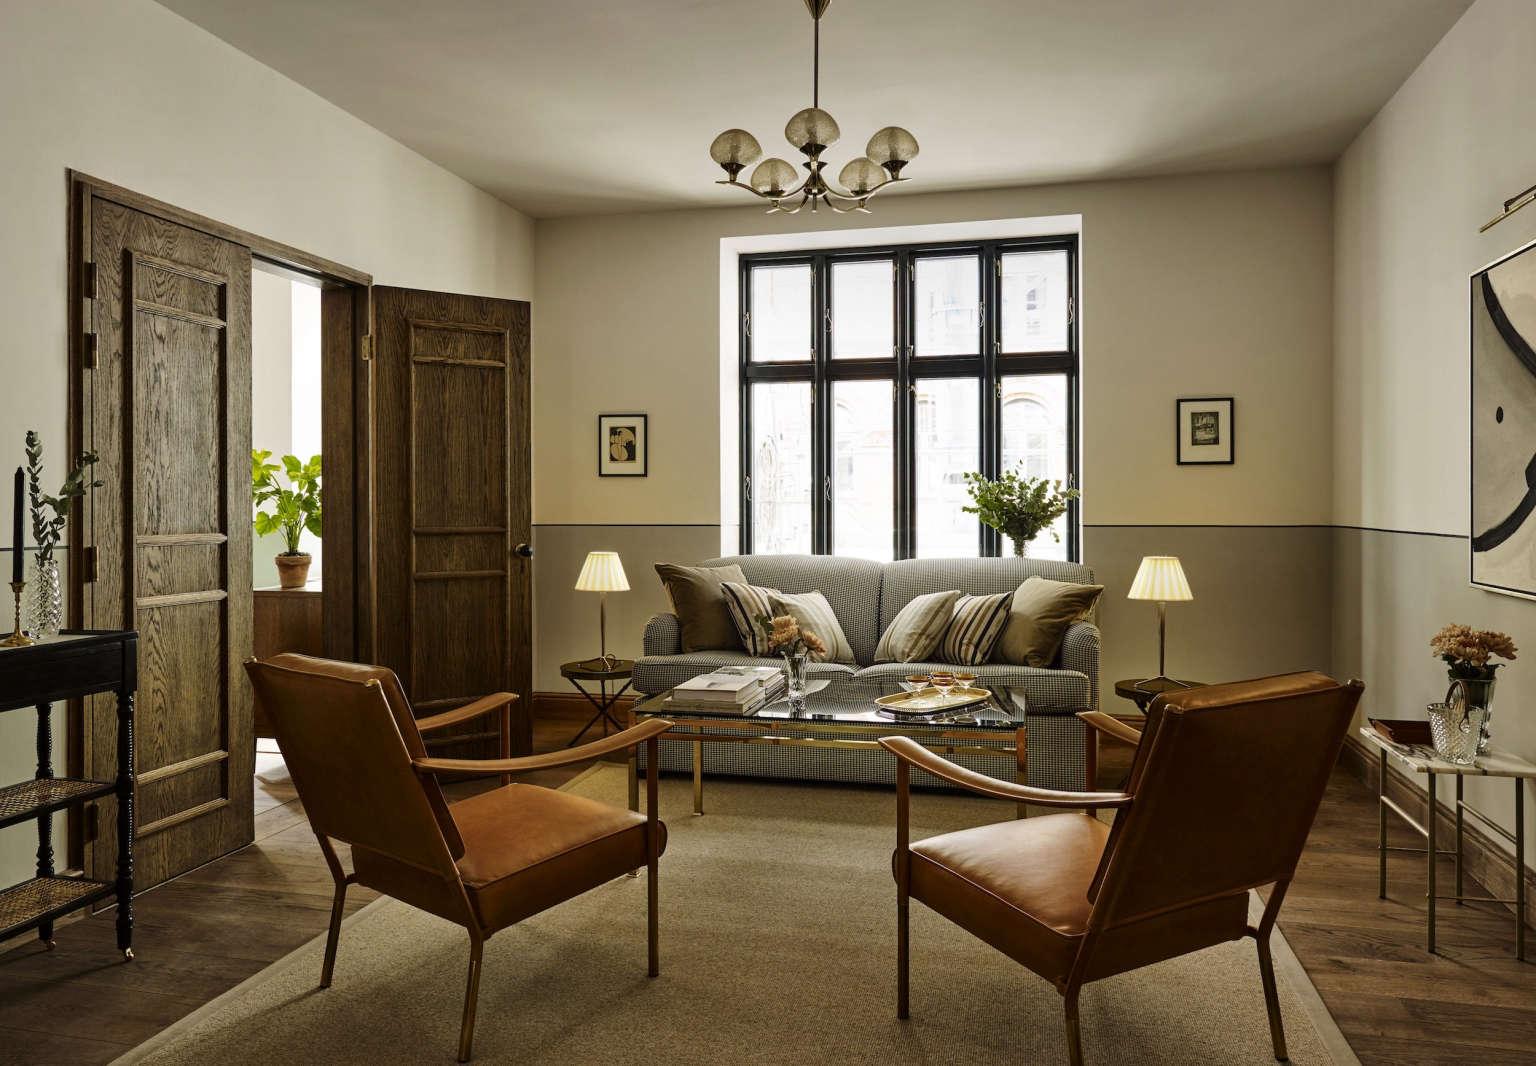 Stay Hotel Kopenhagen : Behind the curtain a former ballet dancer s romantic hotel in